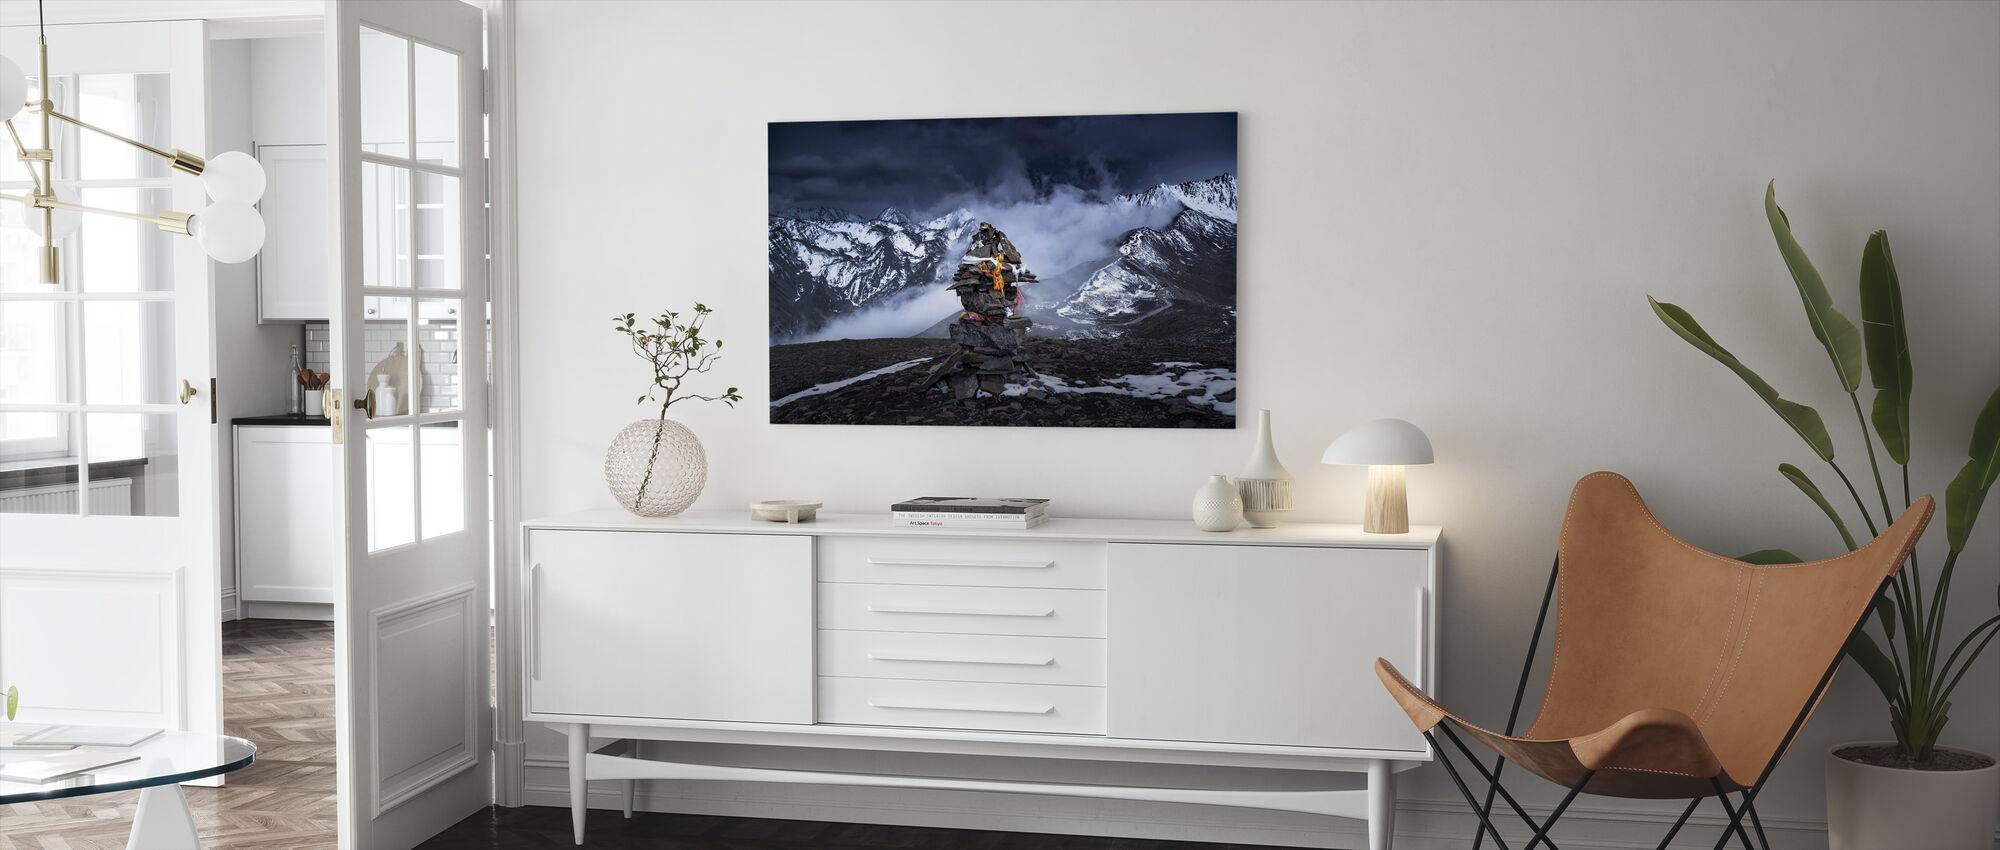 Marnyi Stone - Canvas print - Living Room